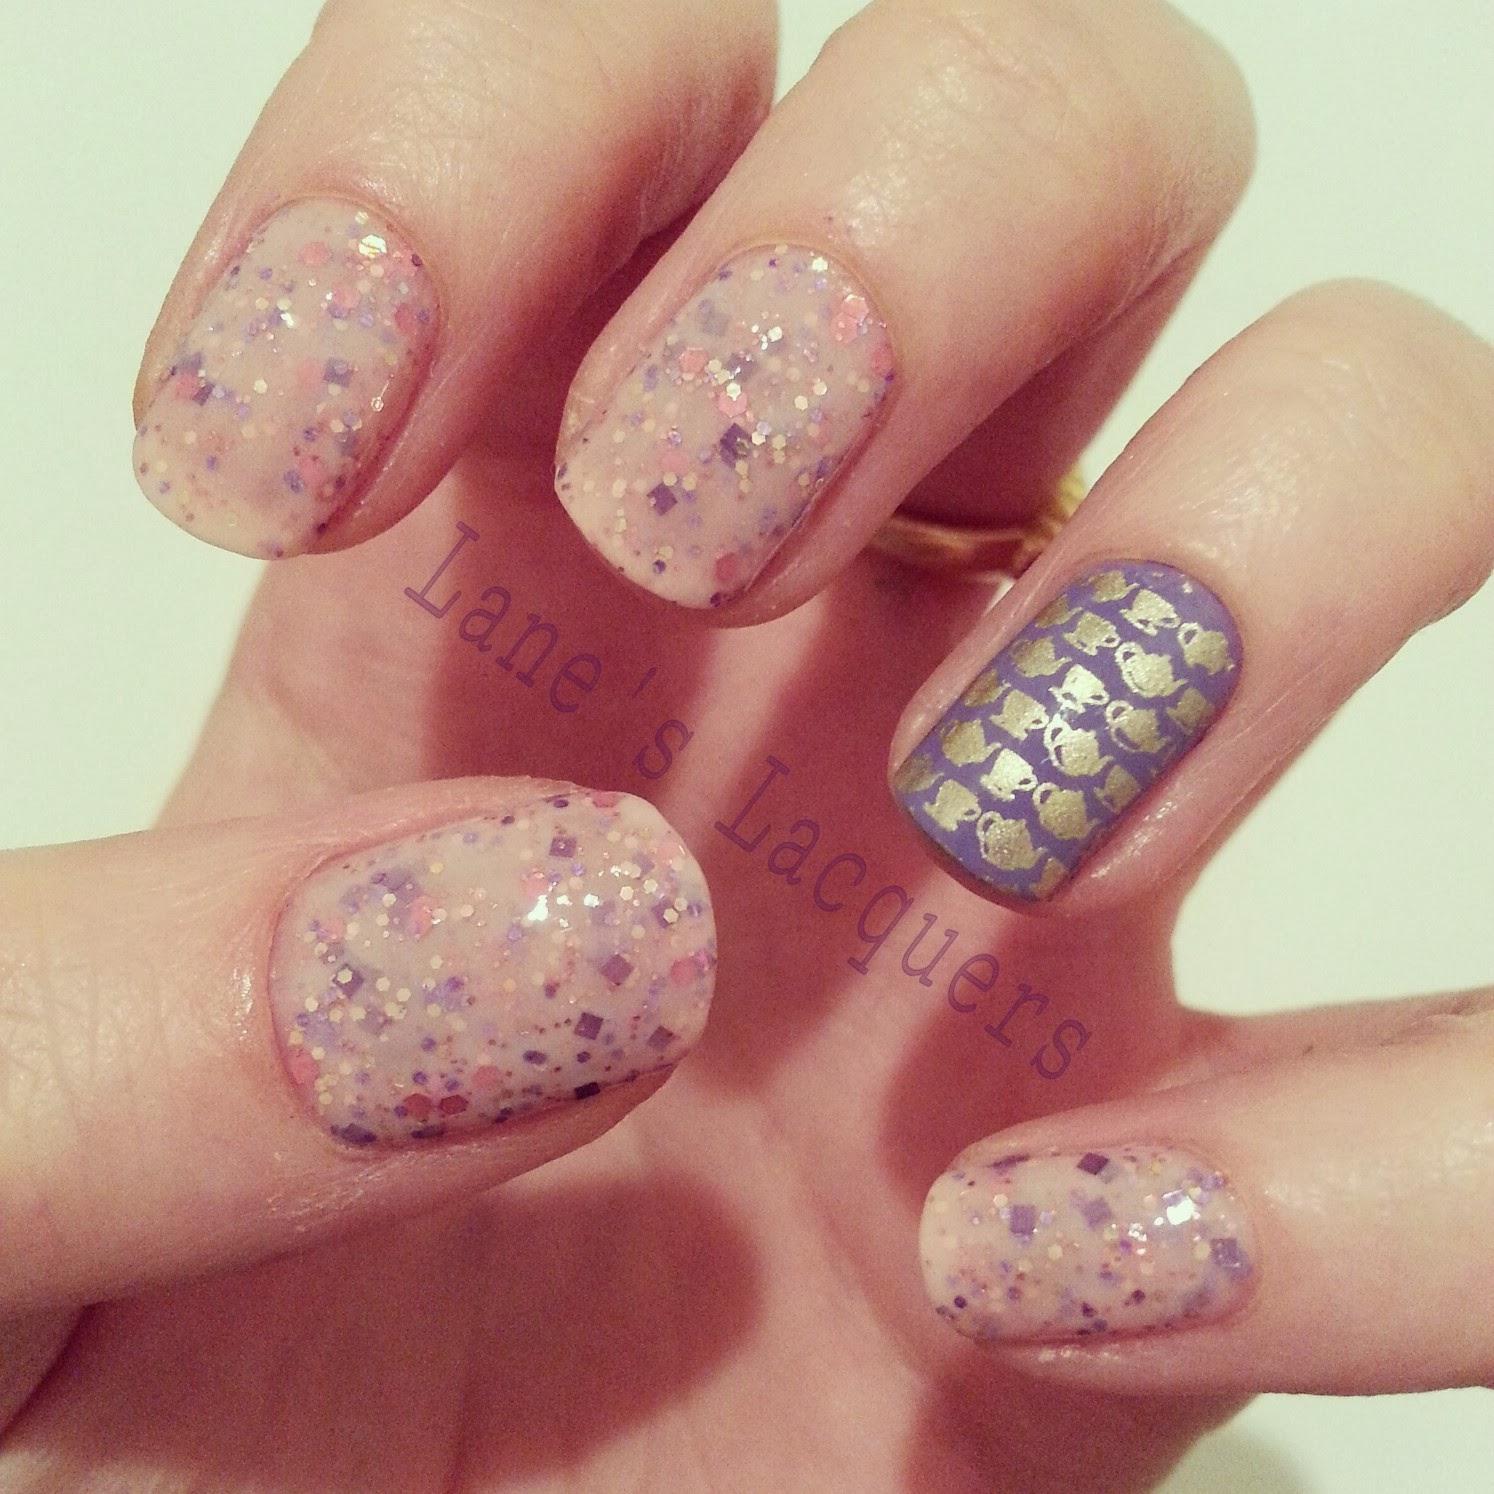 saturday-swatch-happy-hands-lady-goodman-manicure